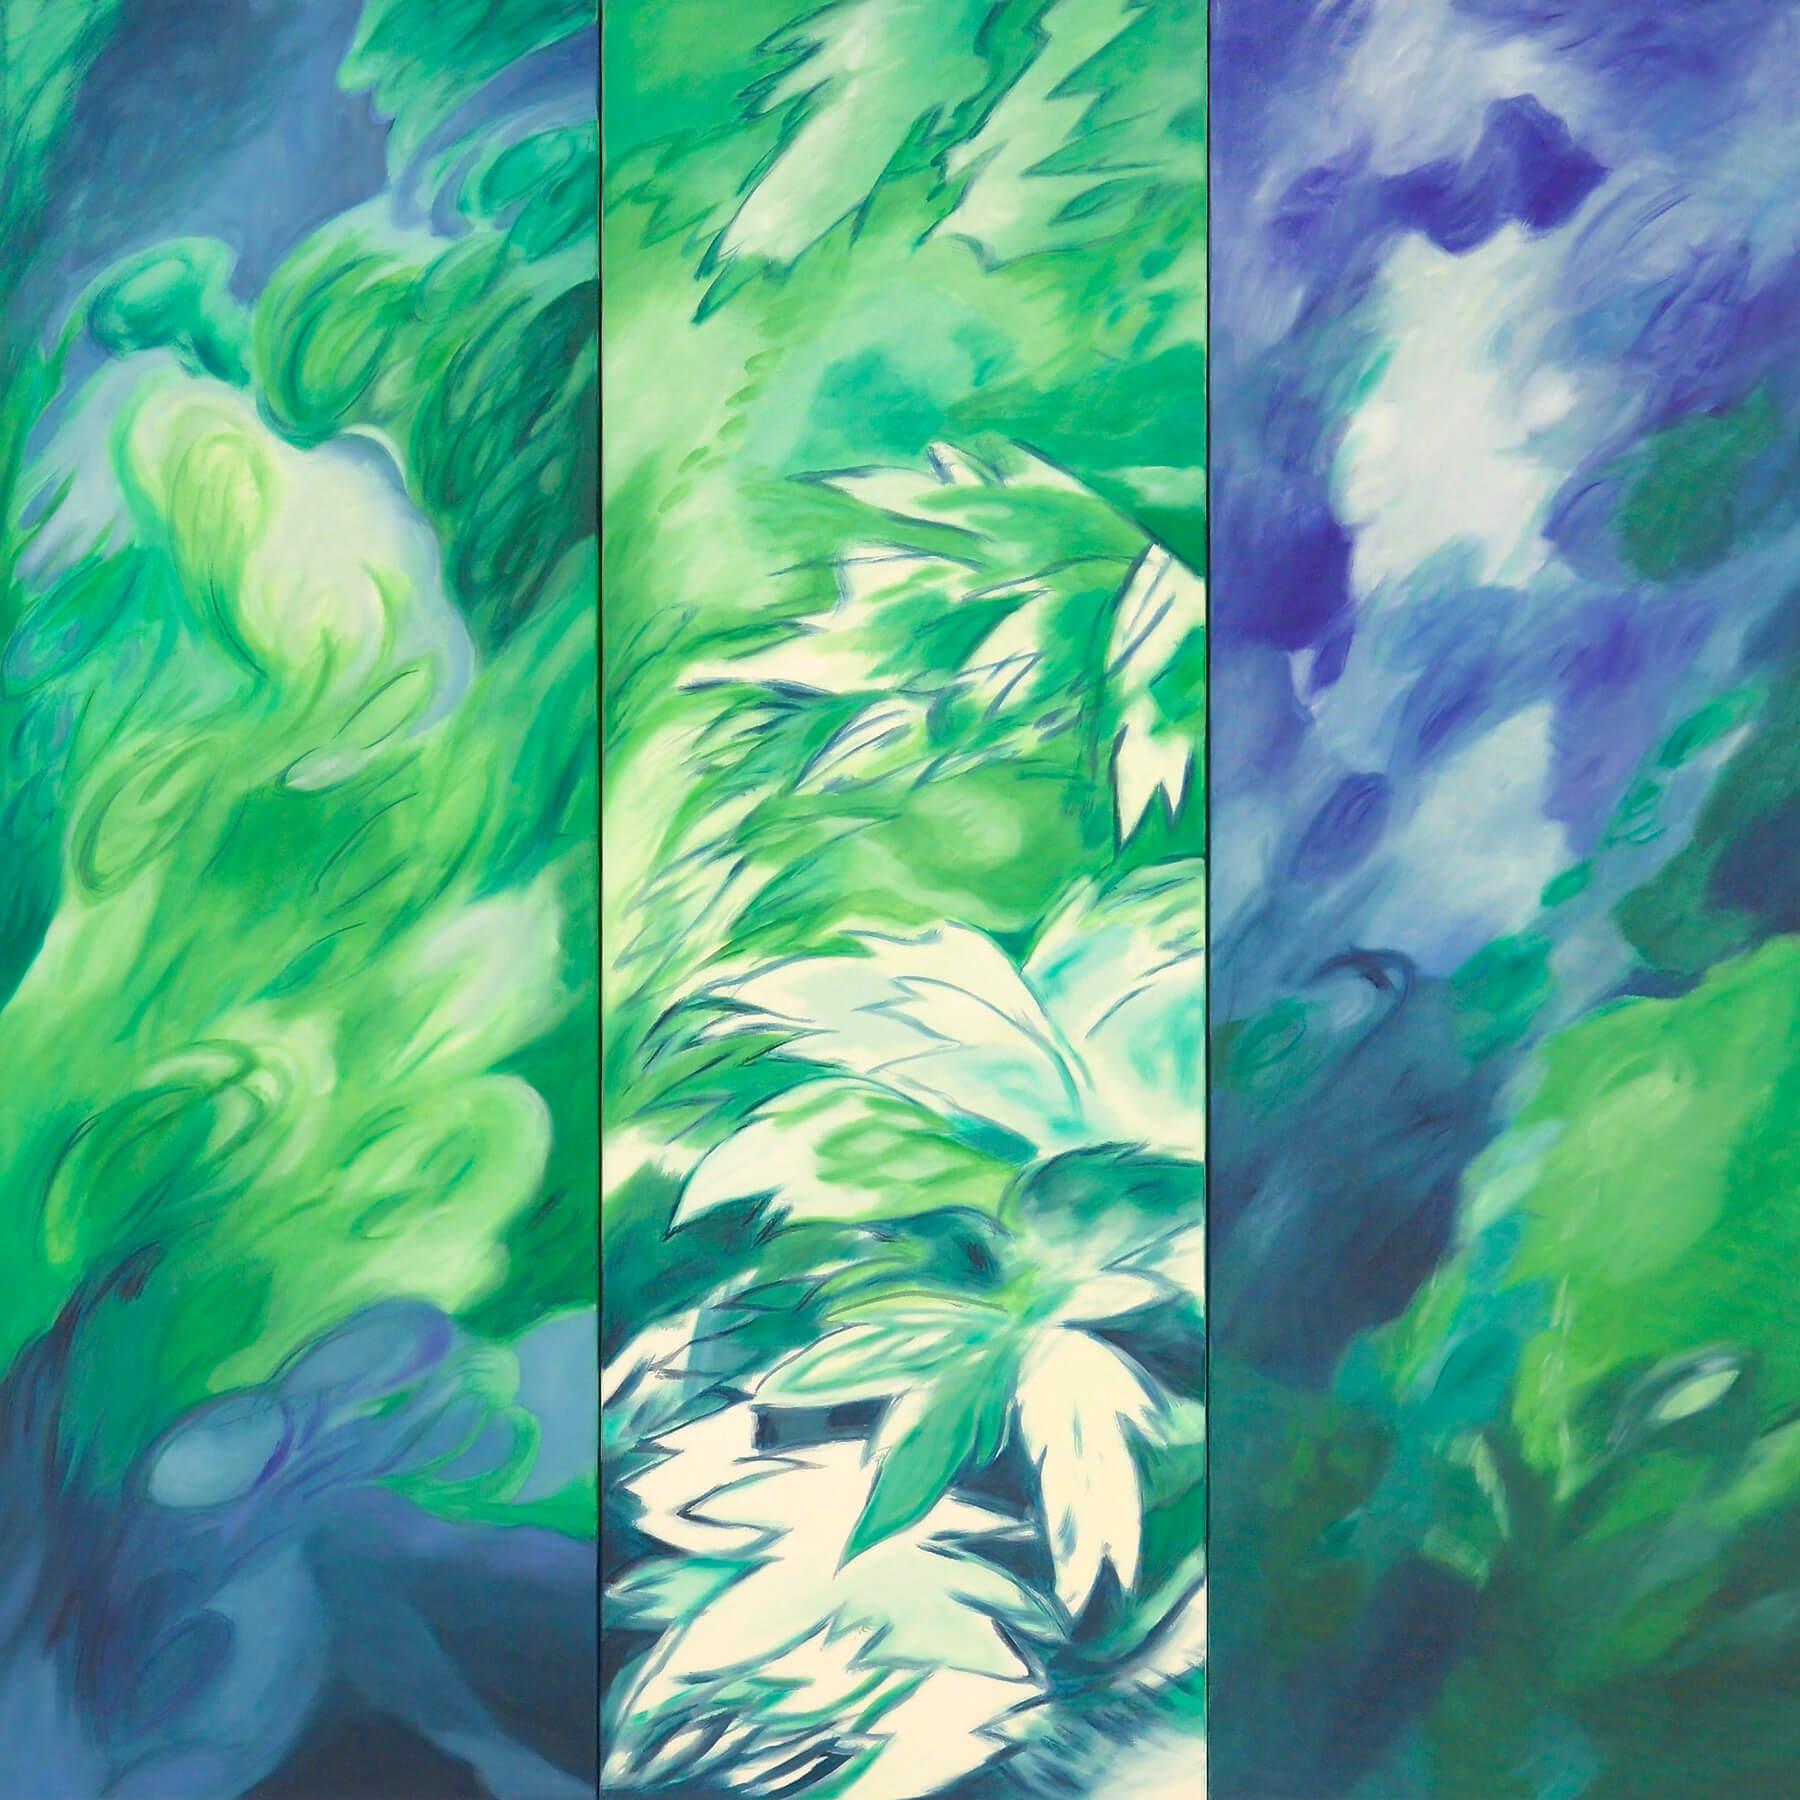 Barbara Jäger Karlsruhe Triptychon Öl auf Leinwand